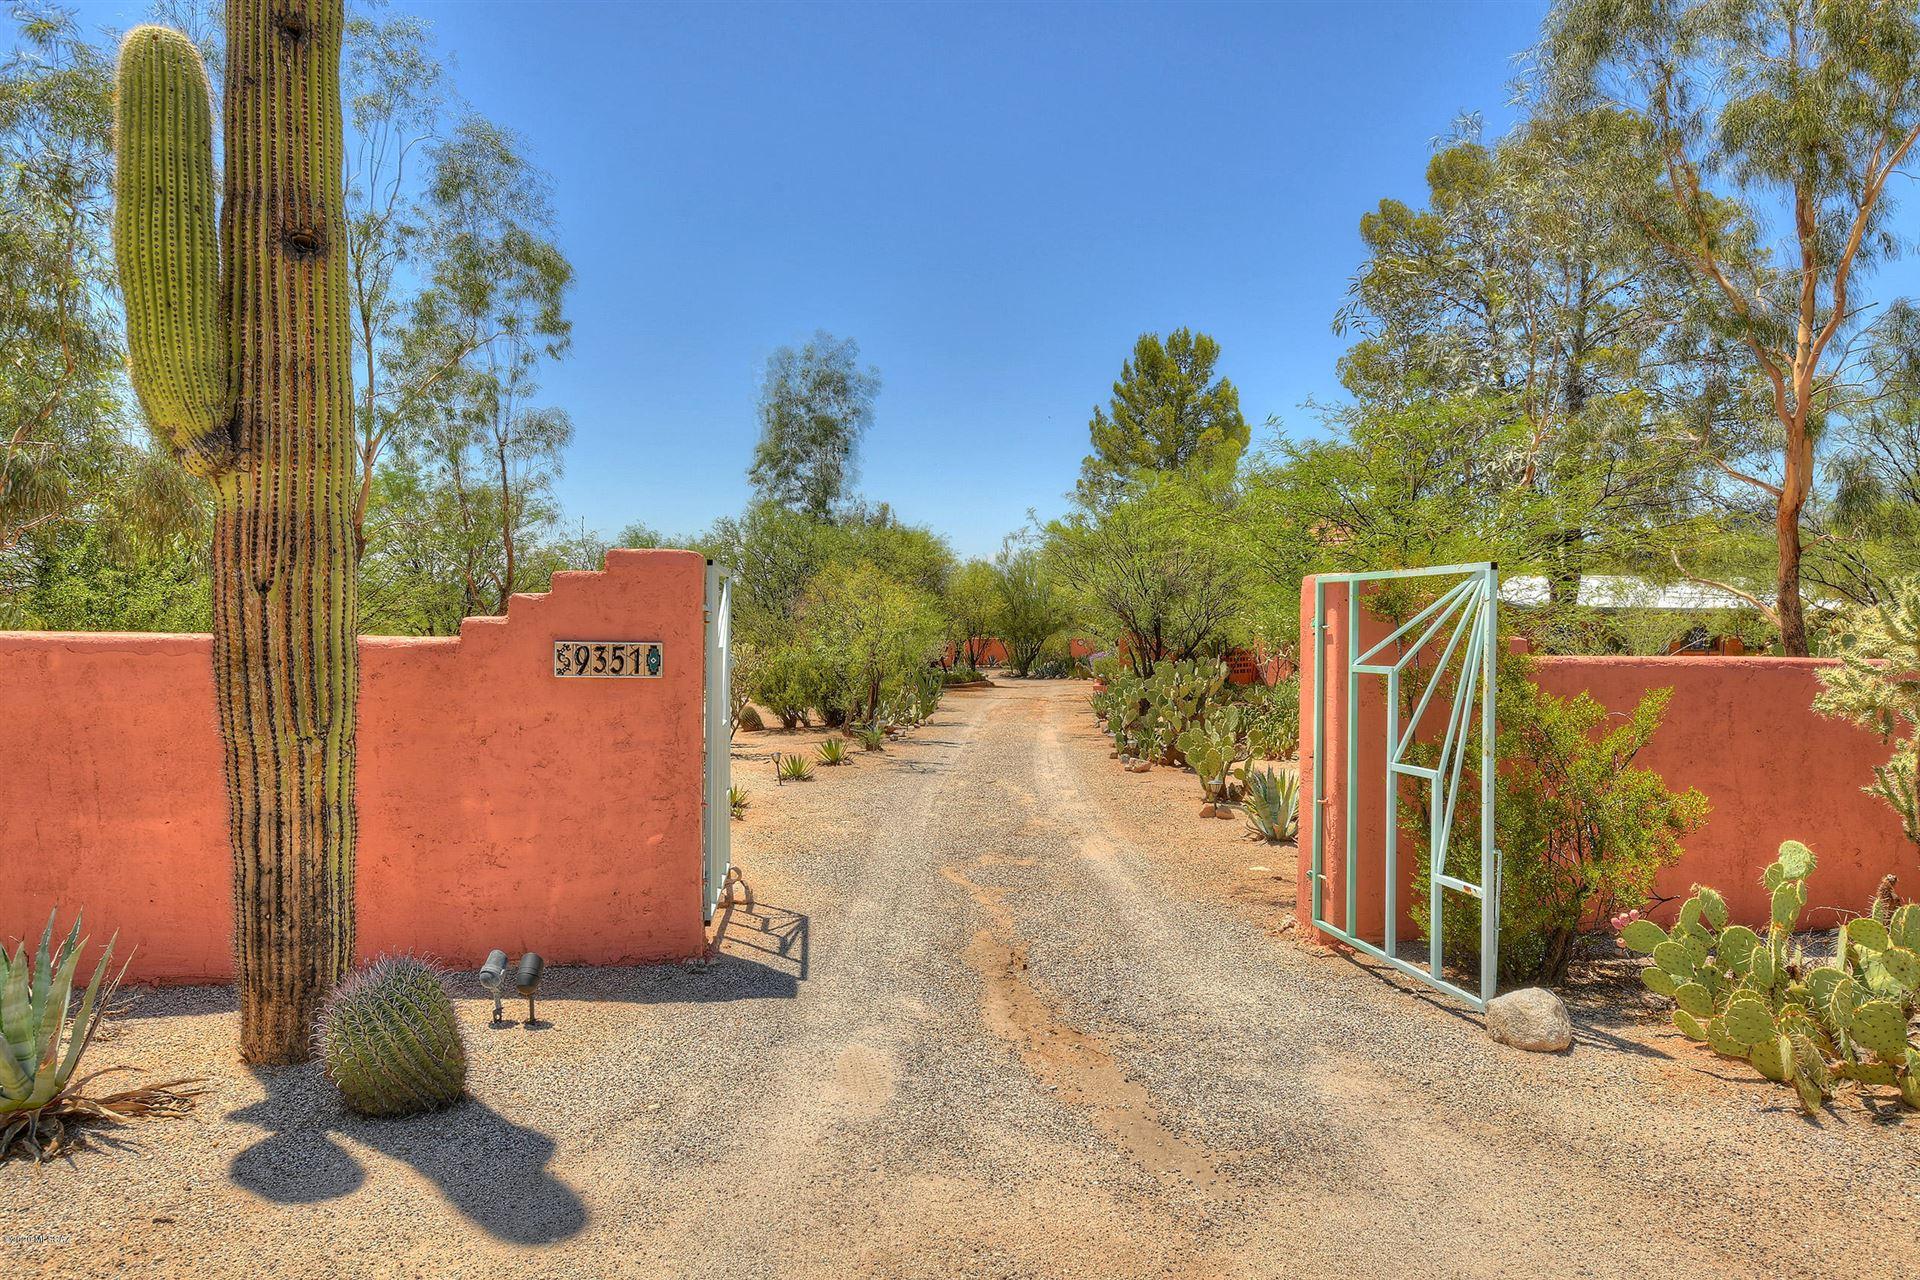 9351 E Morrill Way, Tucson, AZ 85749 - MLS#: 22005234